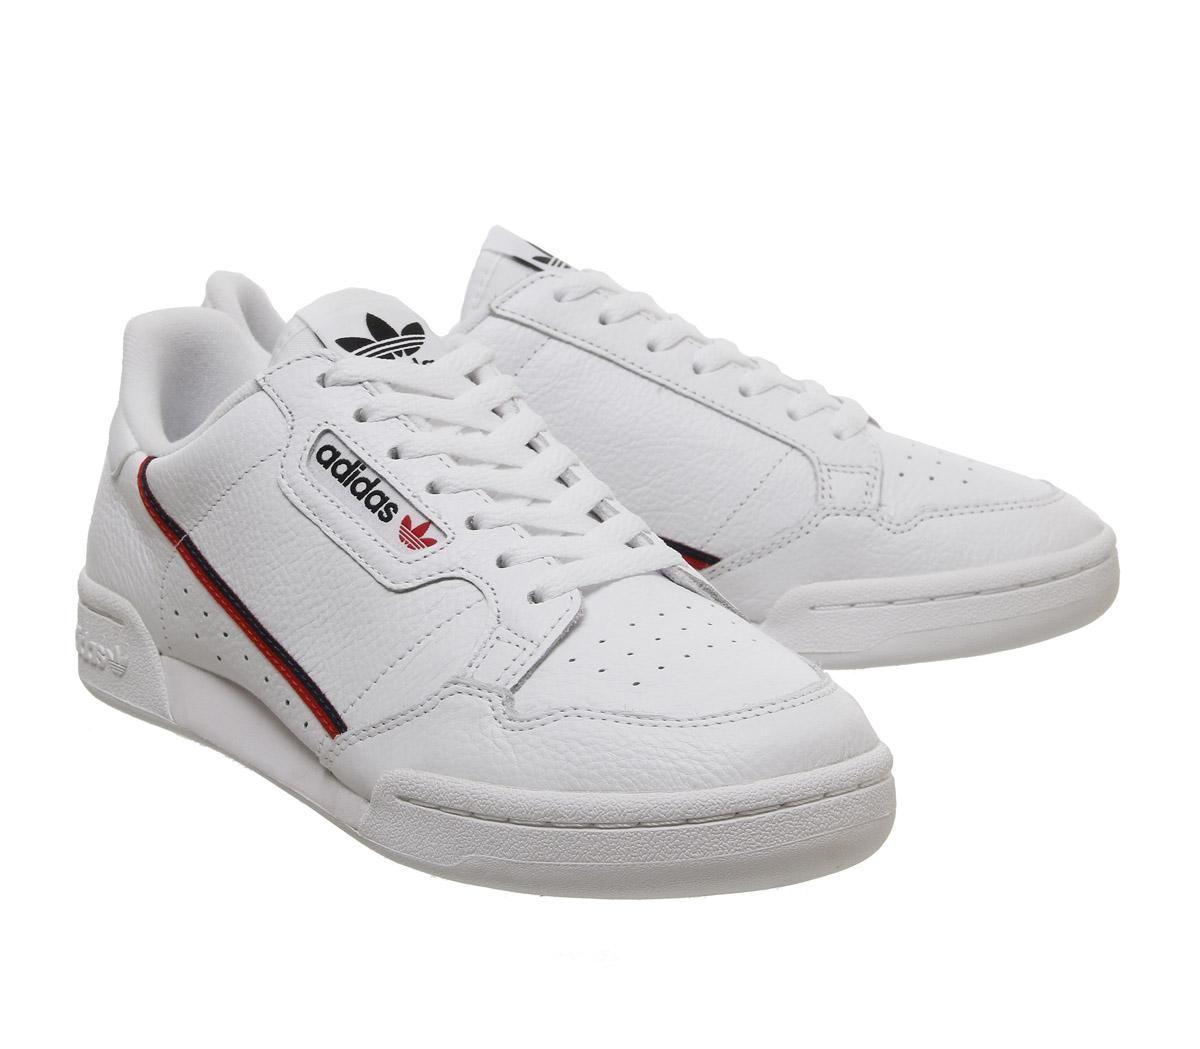 vendita online grande liquidazione i più votati più recenti Dettagli su Adidas Continental 80S Flash Scarpe da Ginnastica Bianche Rosso  Blu Navy